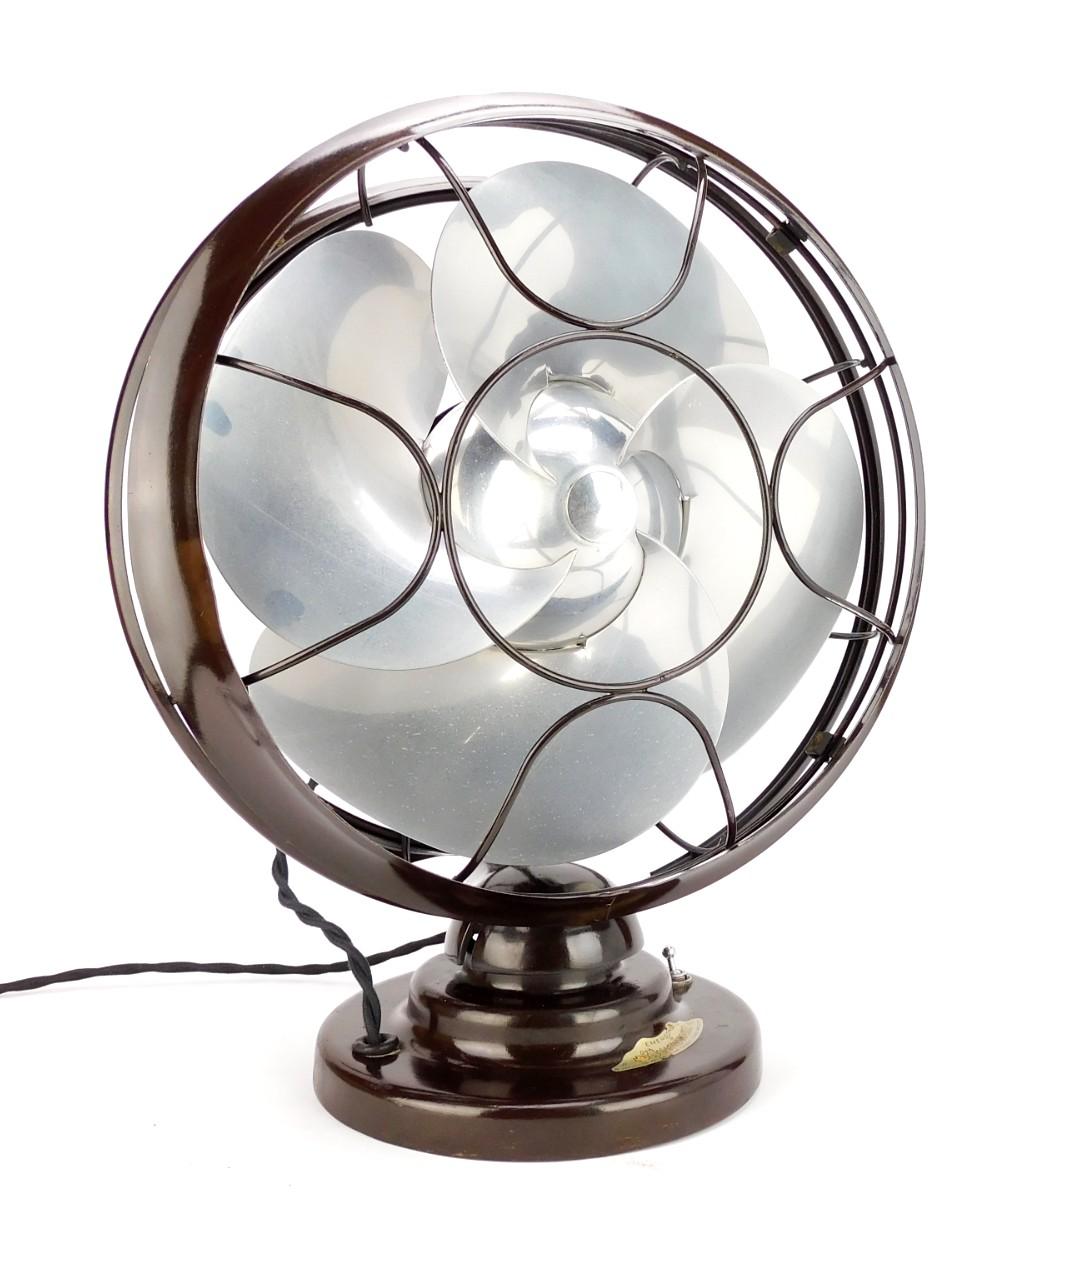 "Time Capsule 1934 10"" Emerson Silver Swan Oscillating Desk Fan"